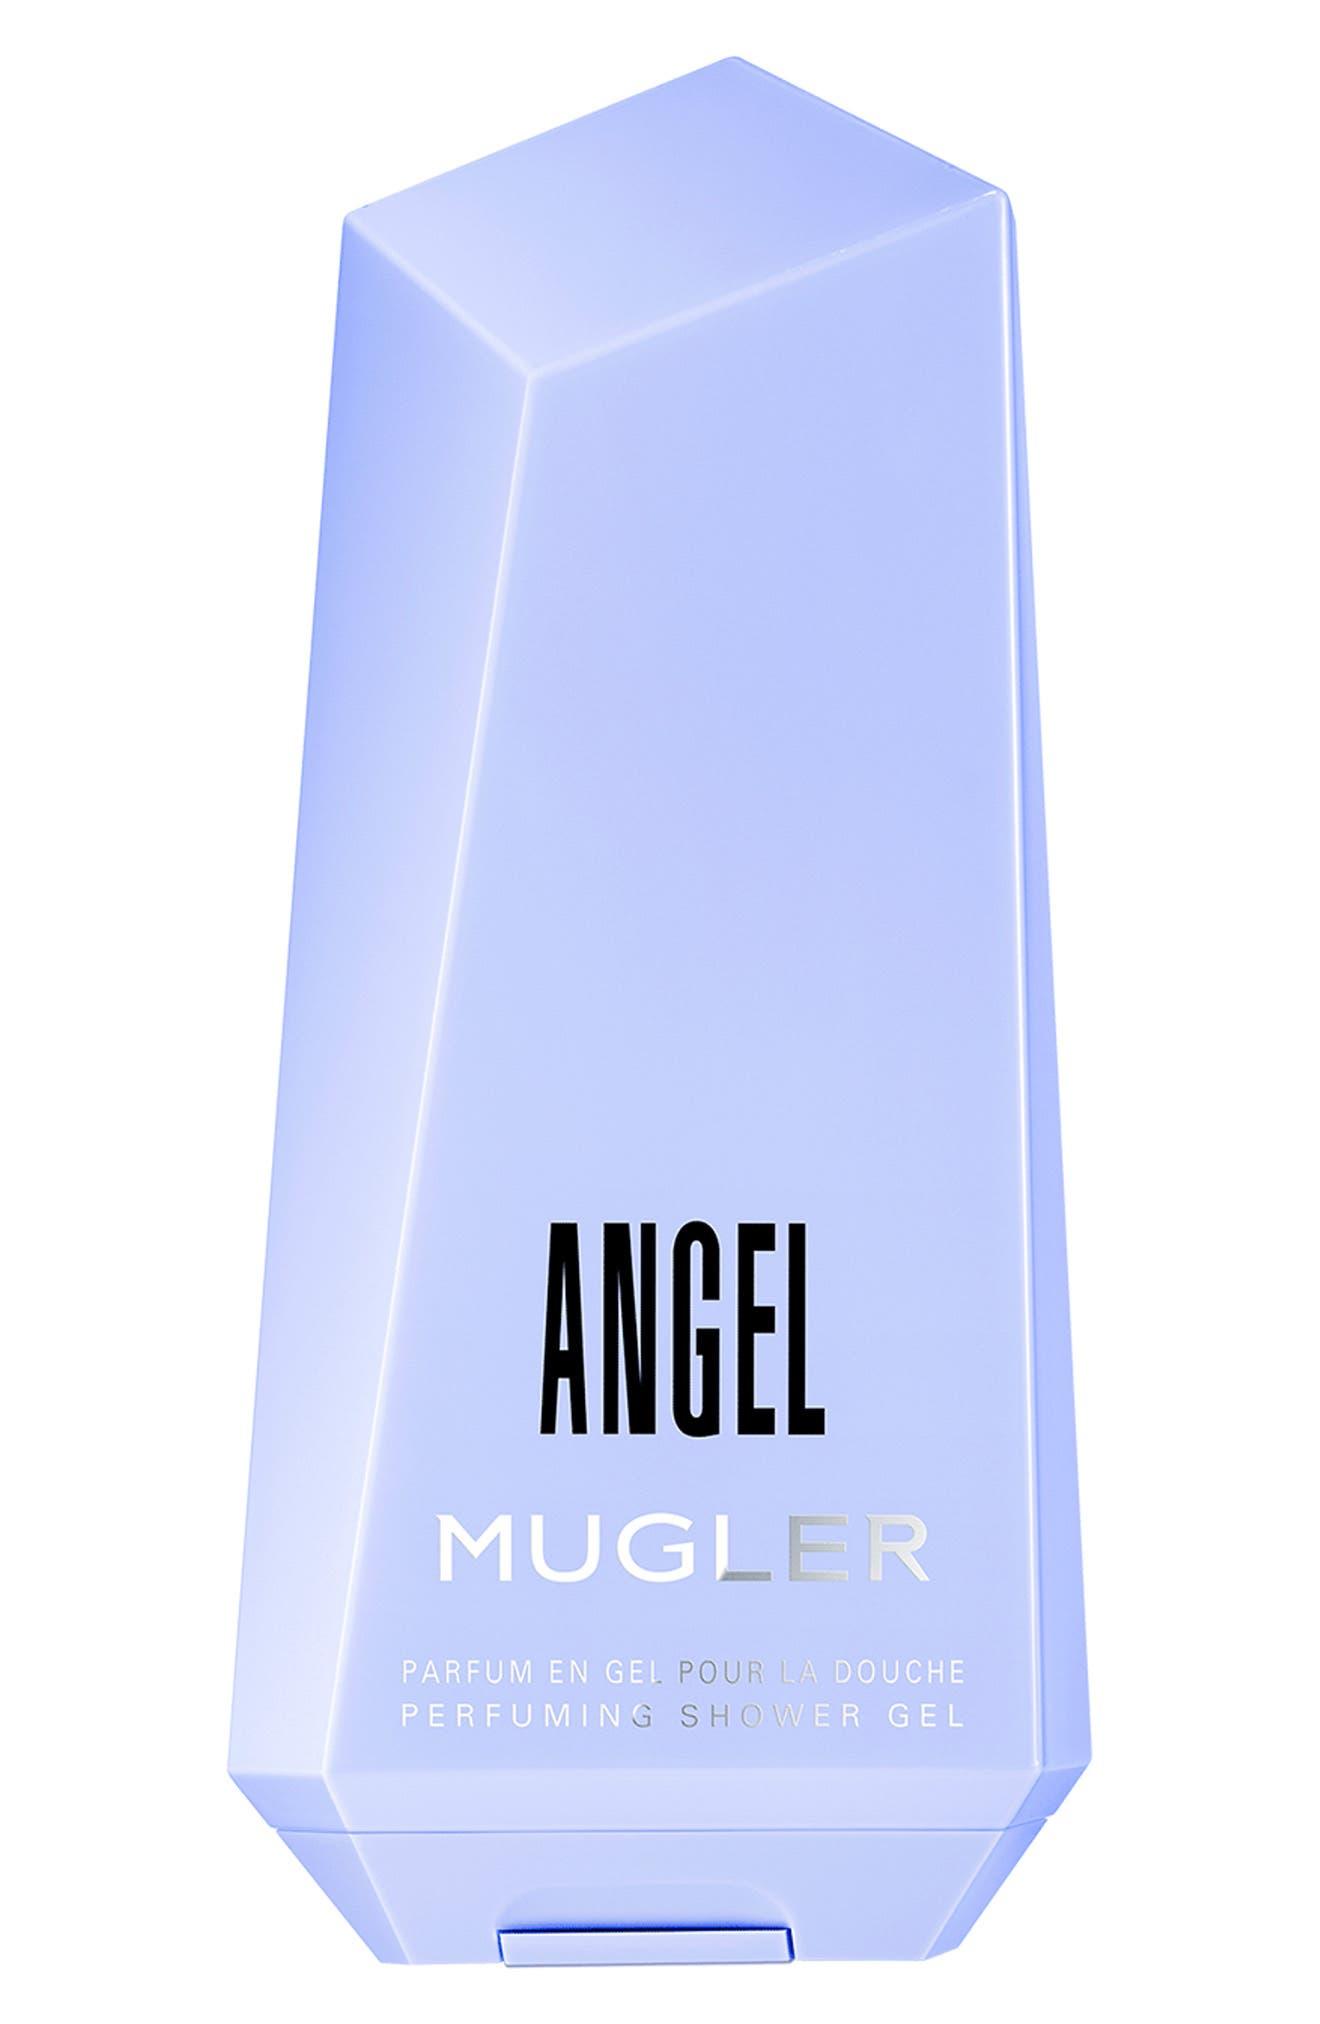 Angel by Mugler Perfuming Shower Gel | Nordstrom